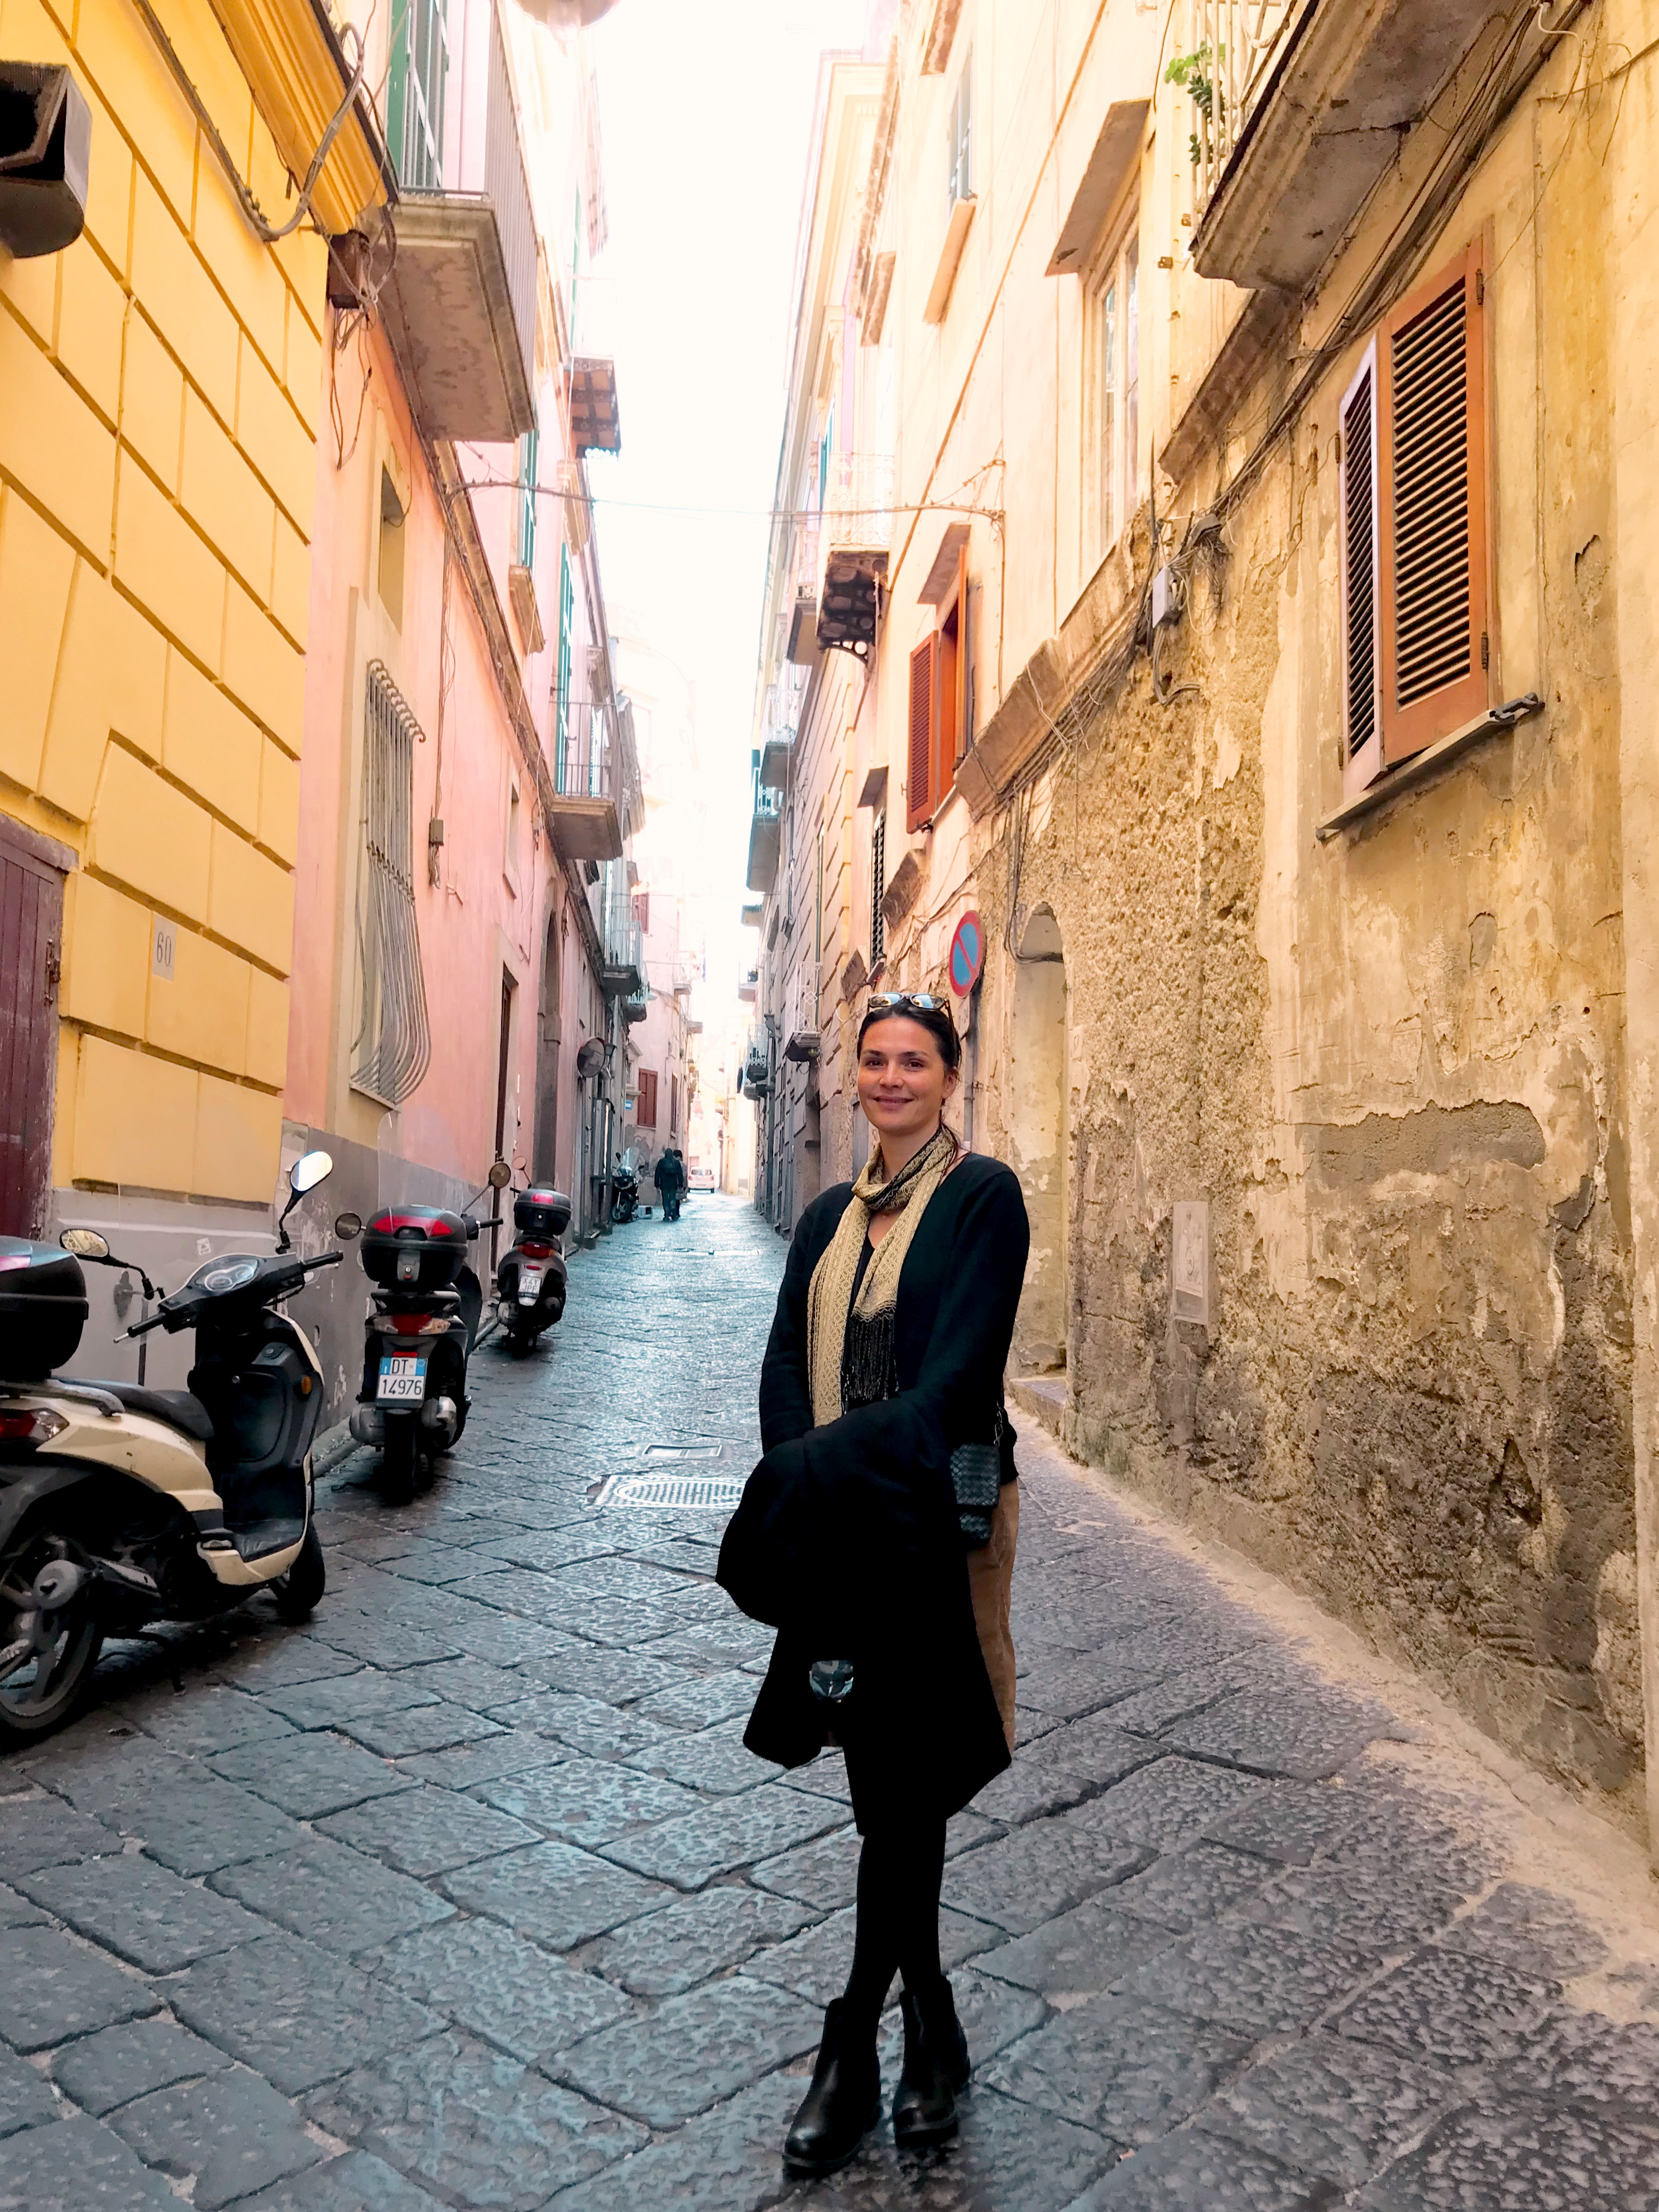 Enge Gassen von Neapel, Frau in Neapel